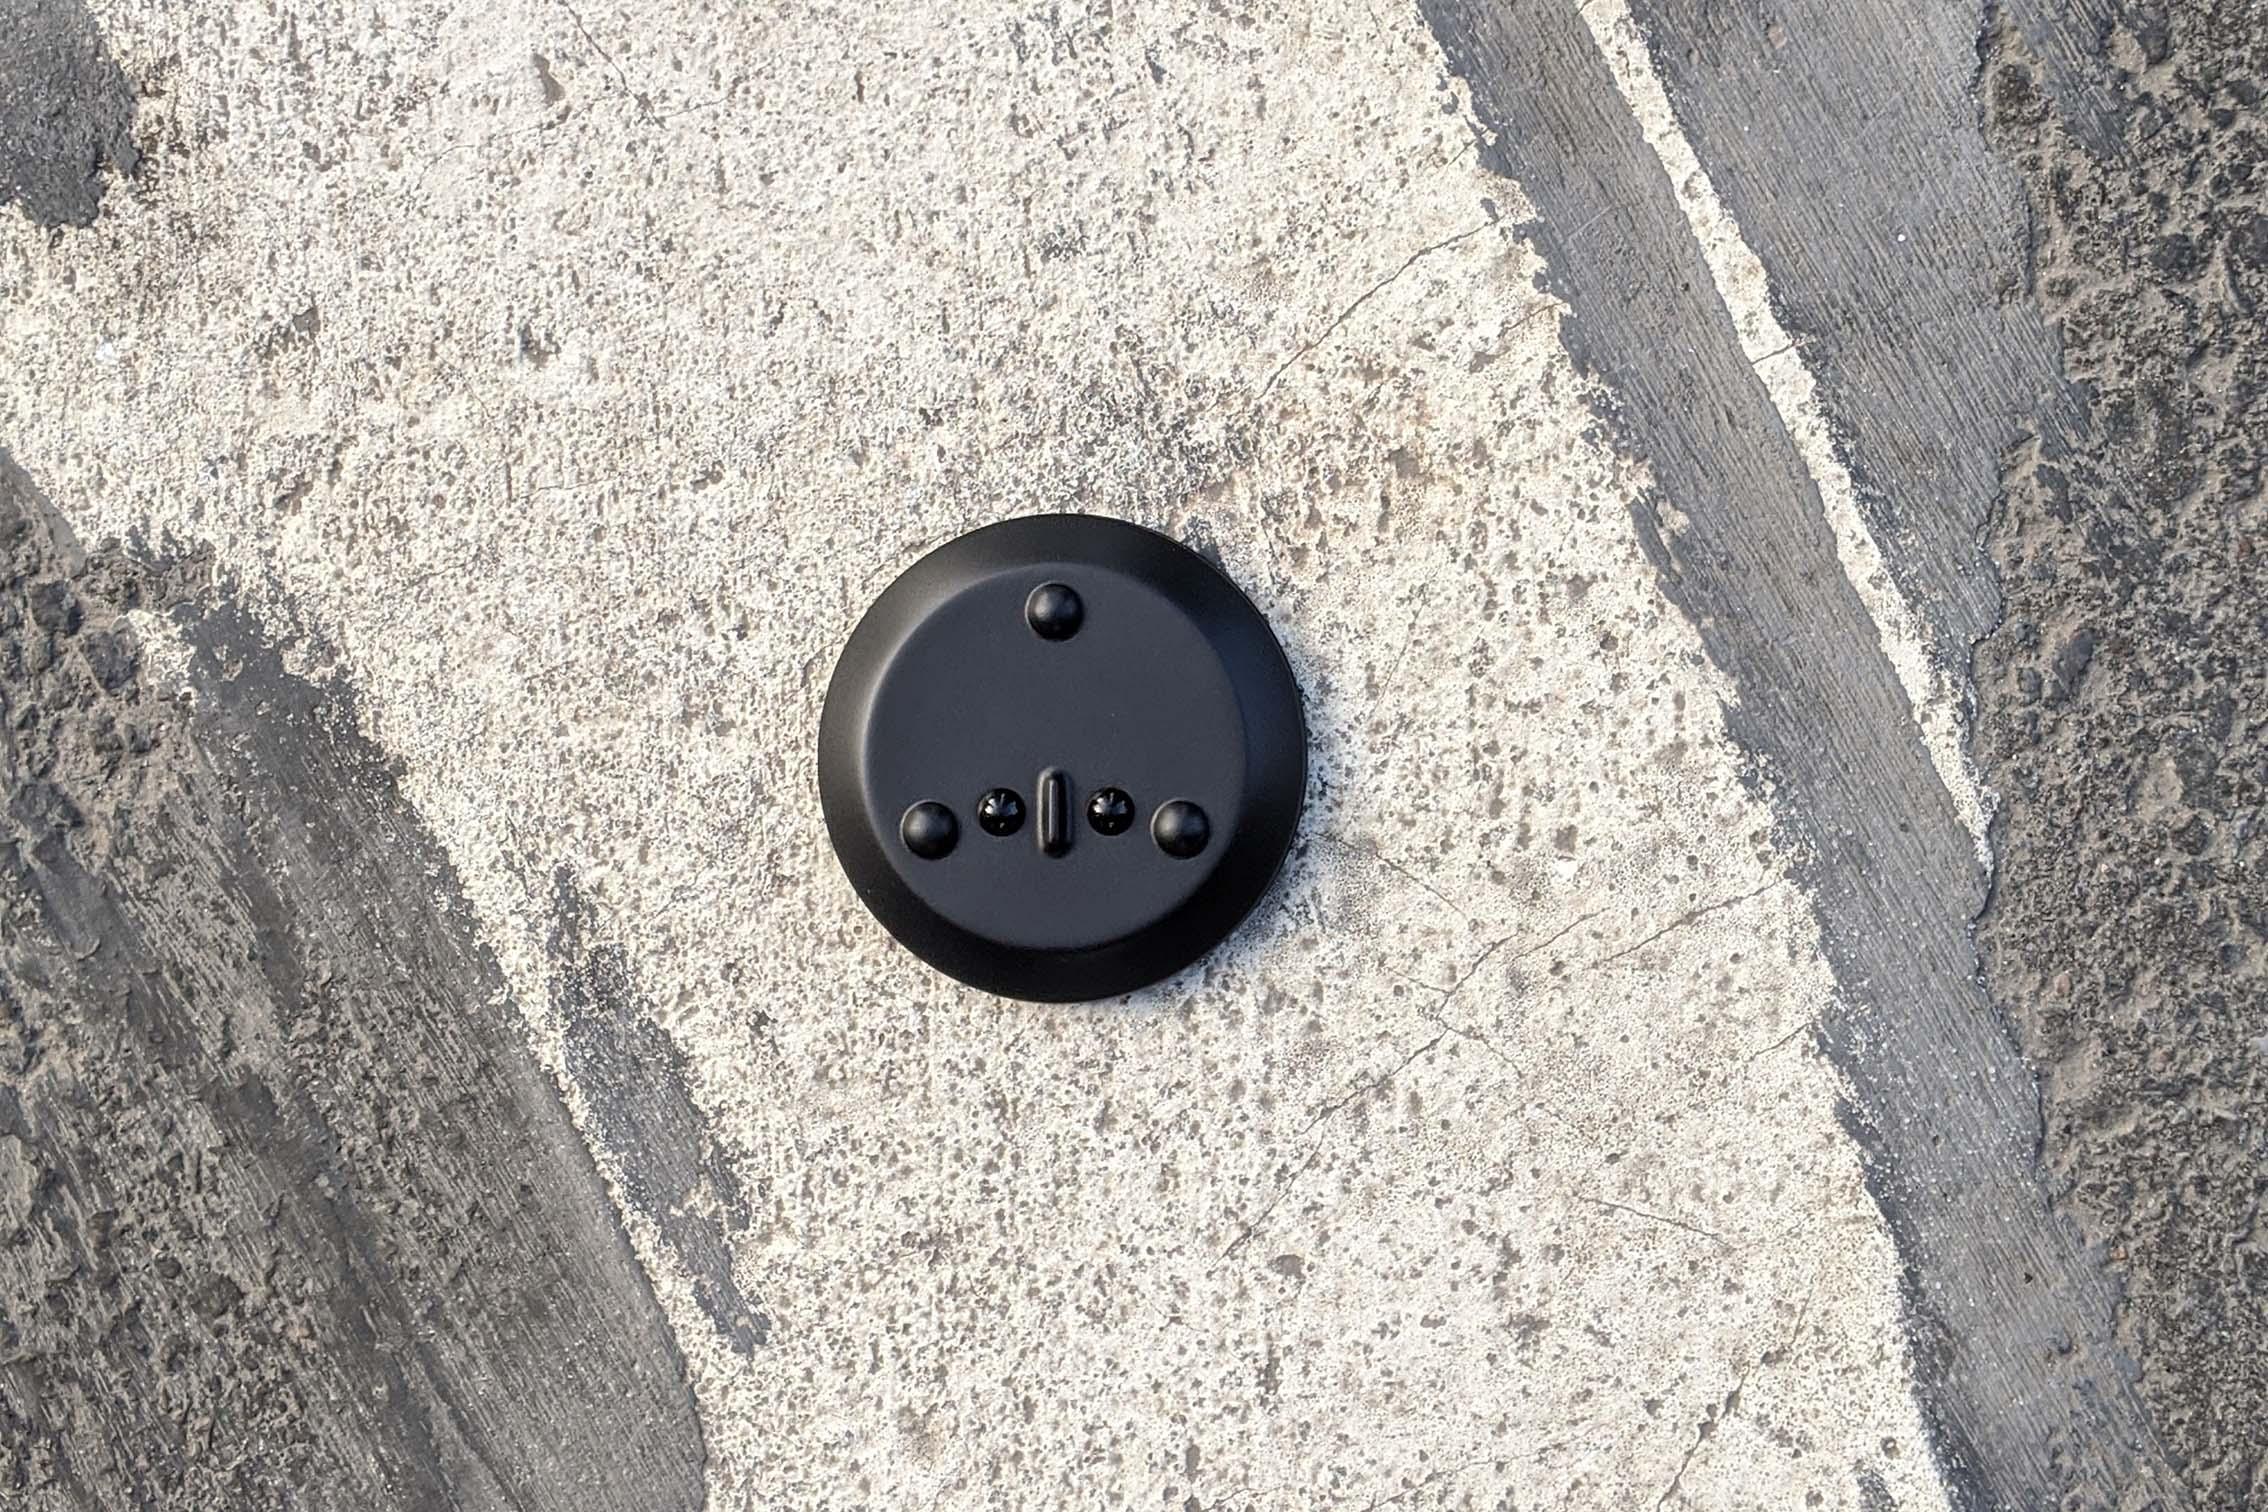 A pebble sensor on the ground